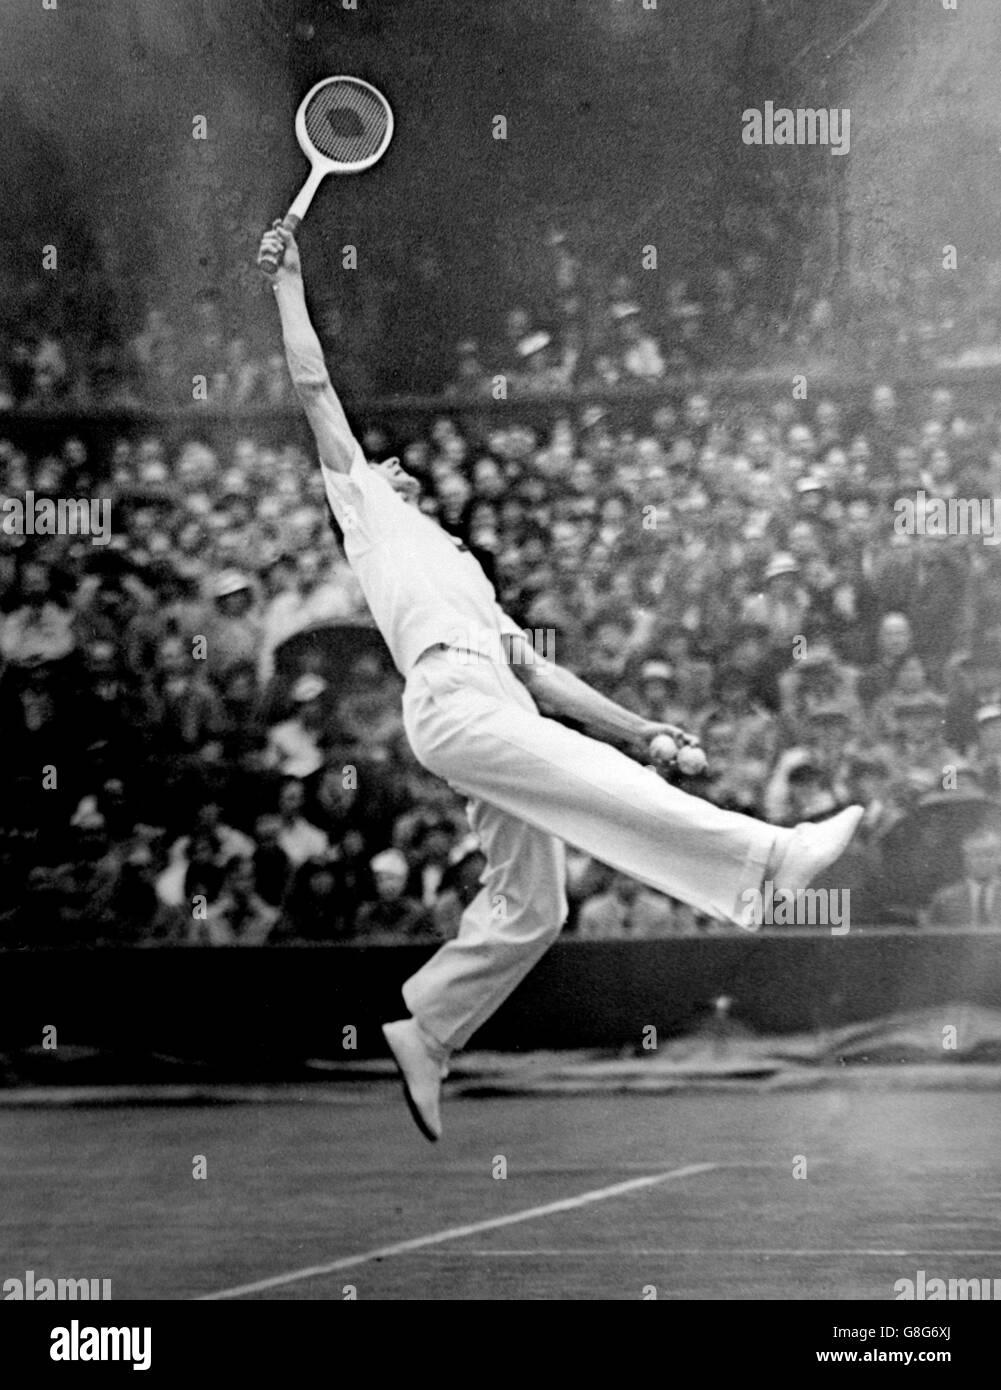 Great Britain v Australia - Davis Cup - Final - Centre Court - 1936 - Stock Image